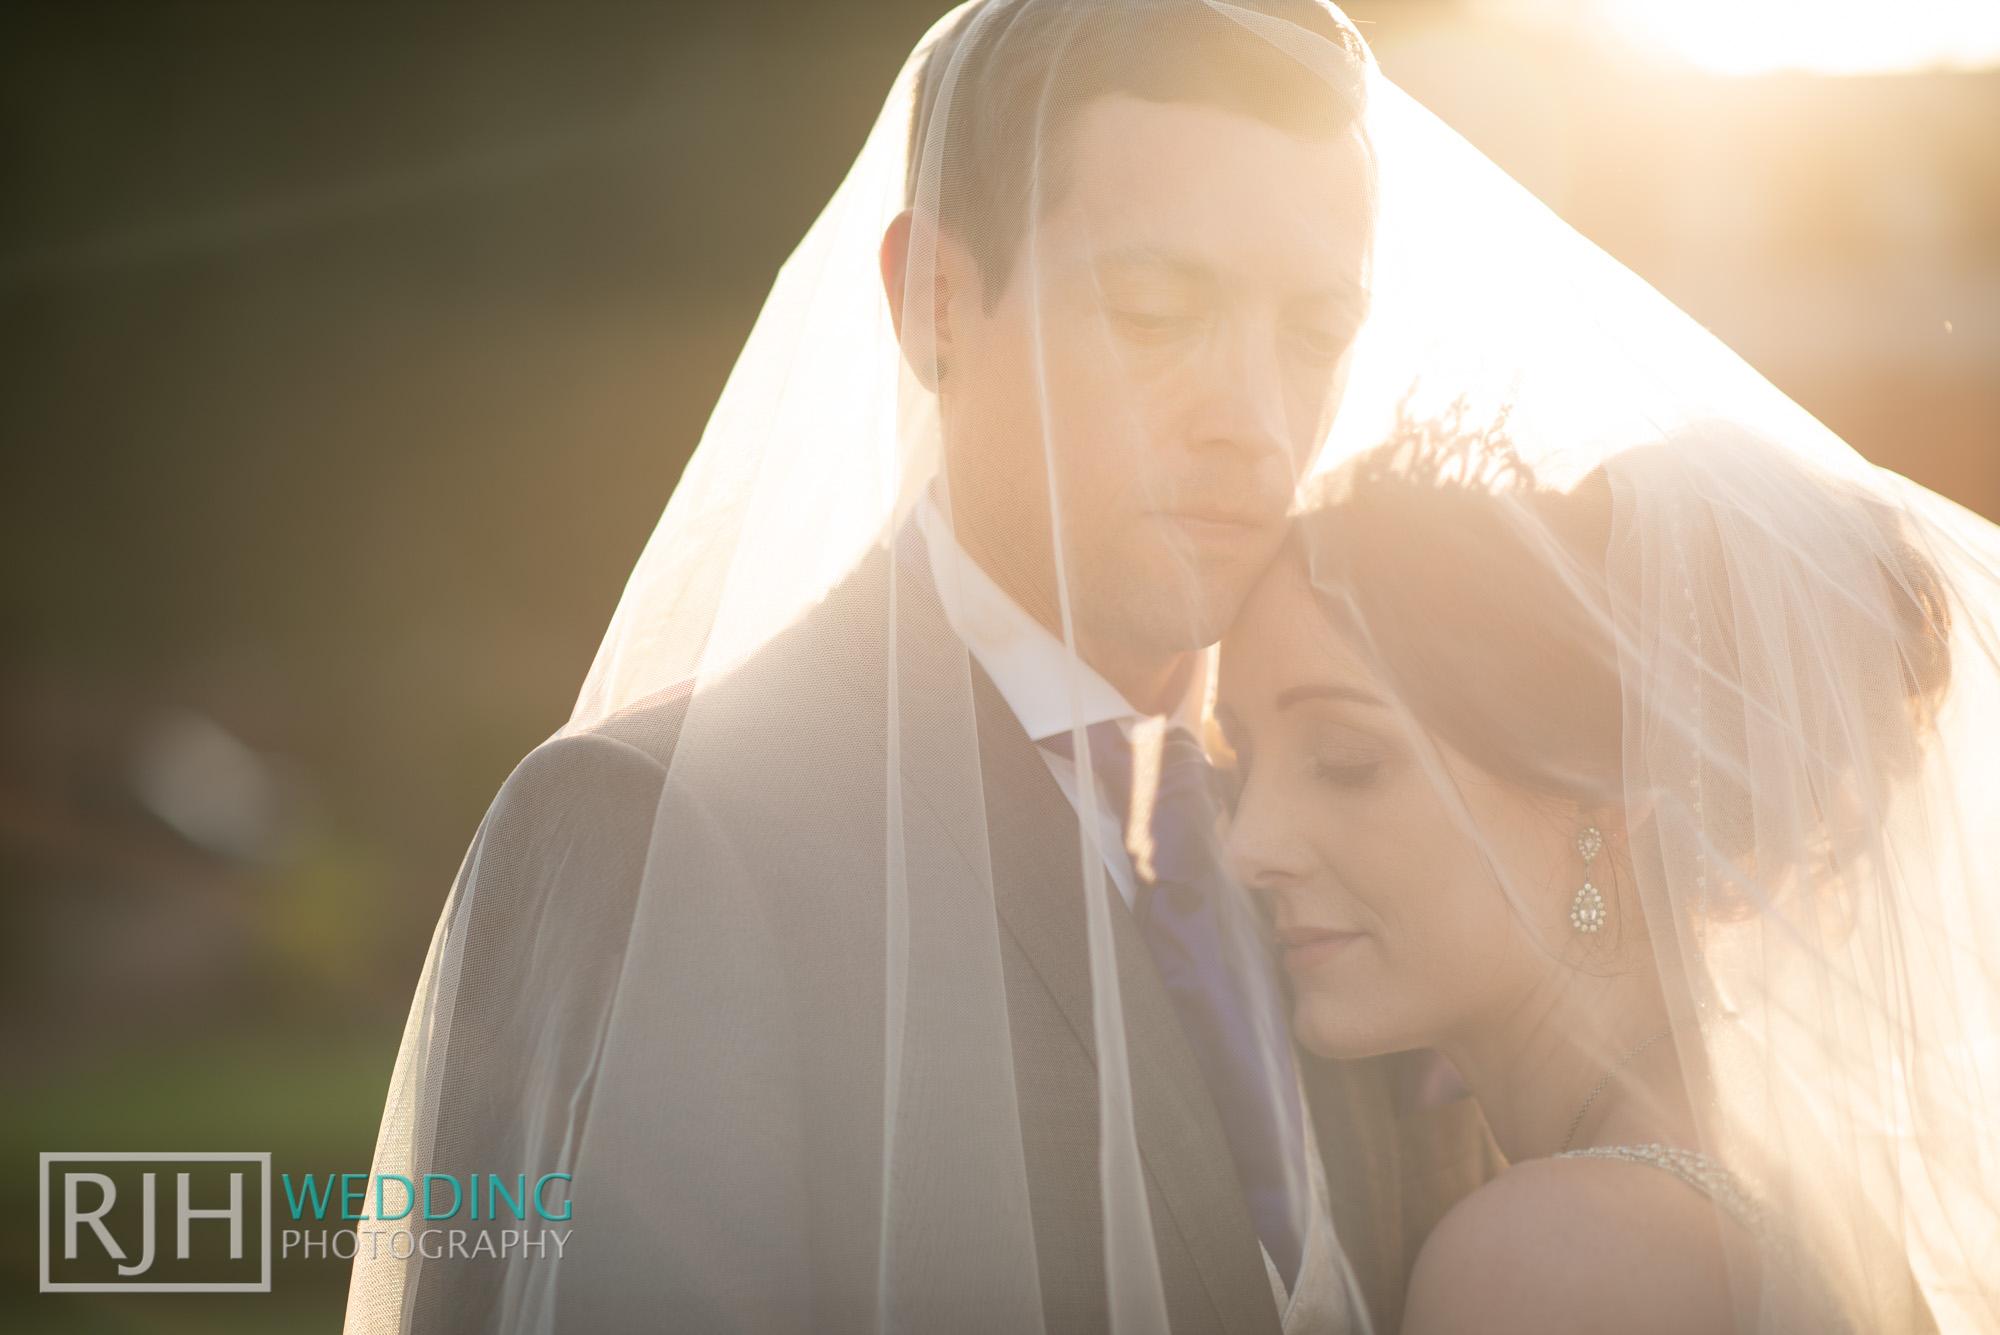 Oulton Hall Wedding Photography_Goodwill-Hall_046_DSC_4012.jpg